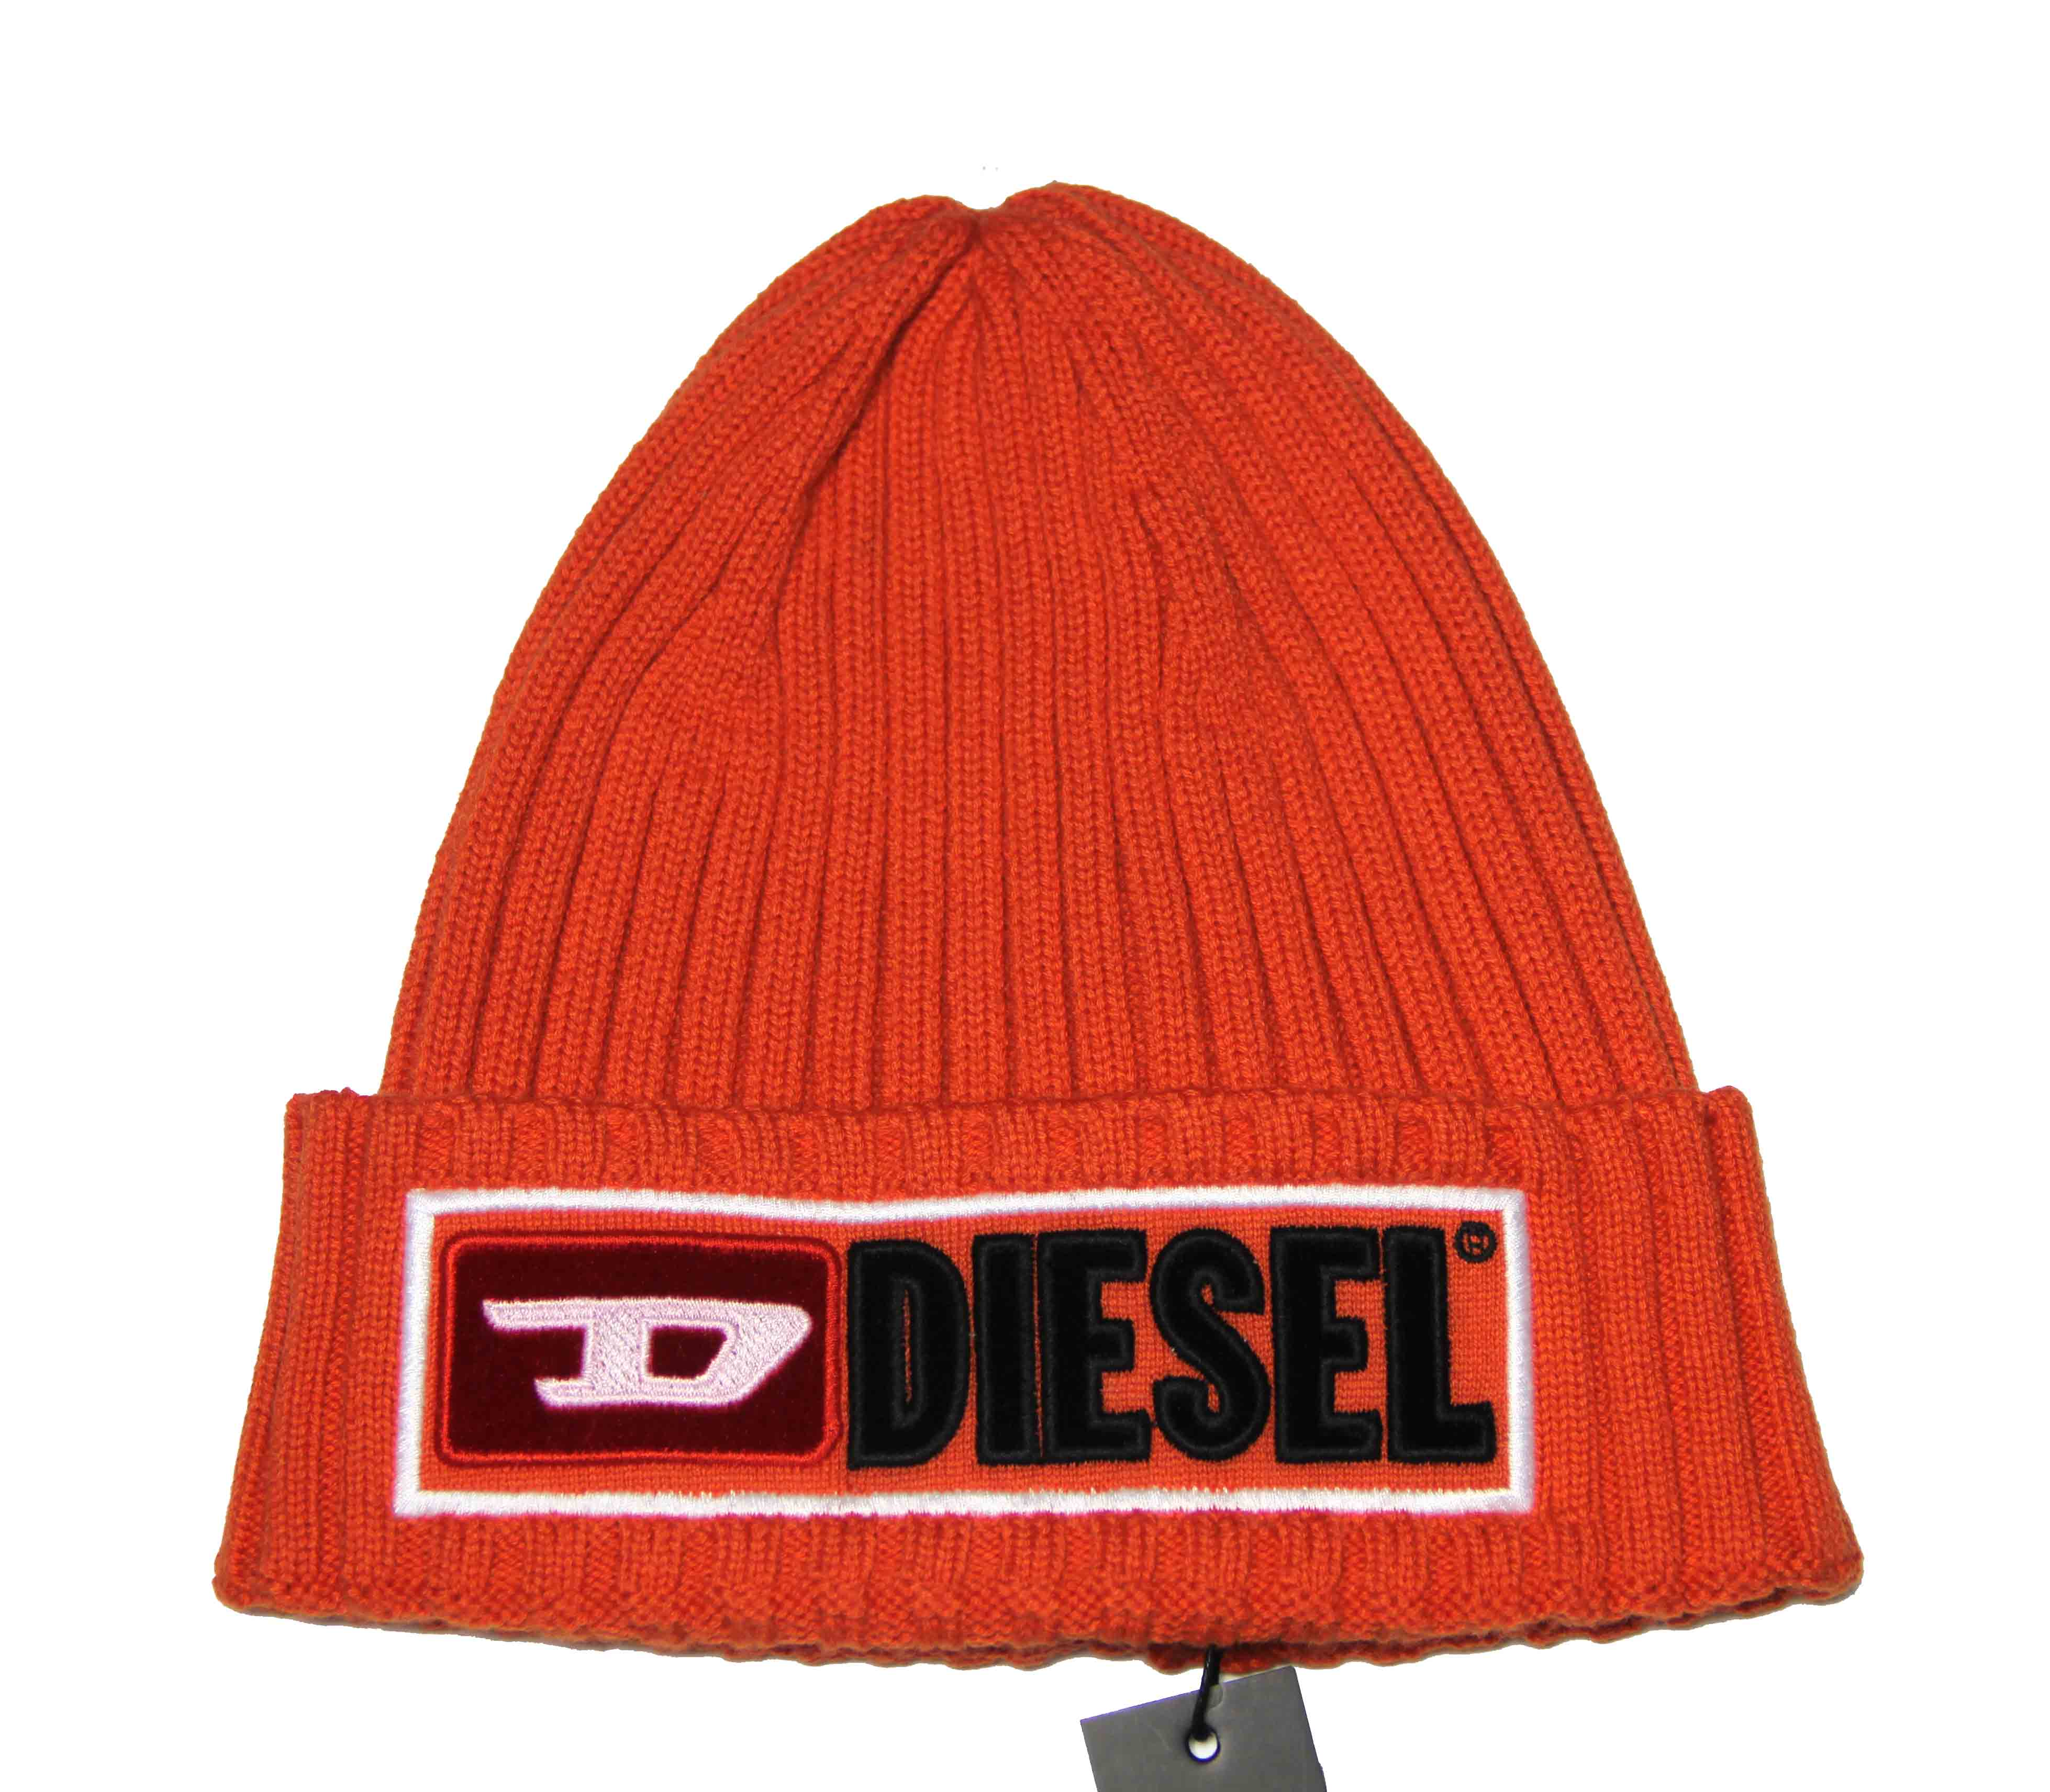 Diesel Skull Cap Hat Wool and Cotton Orange Men's One Size